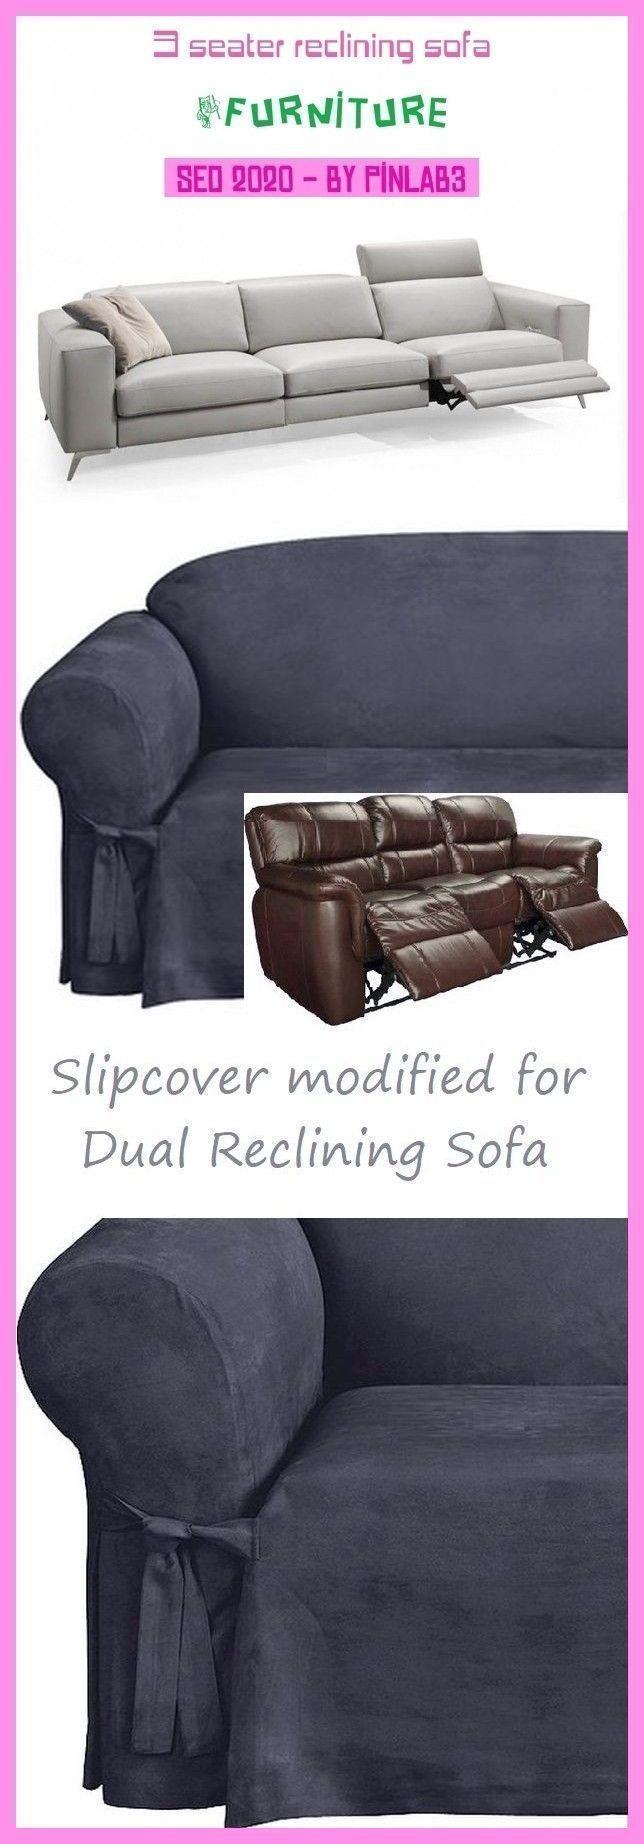 Kleineswohnzimmer Fountain Pens Single Recliner Single Recliner Sofa Reclining Sofa Slipcover In 2020 Reclining Sofa Decor Reclining Sofa Living Room Leather